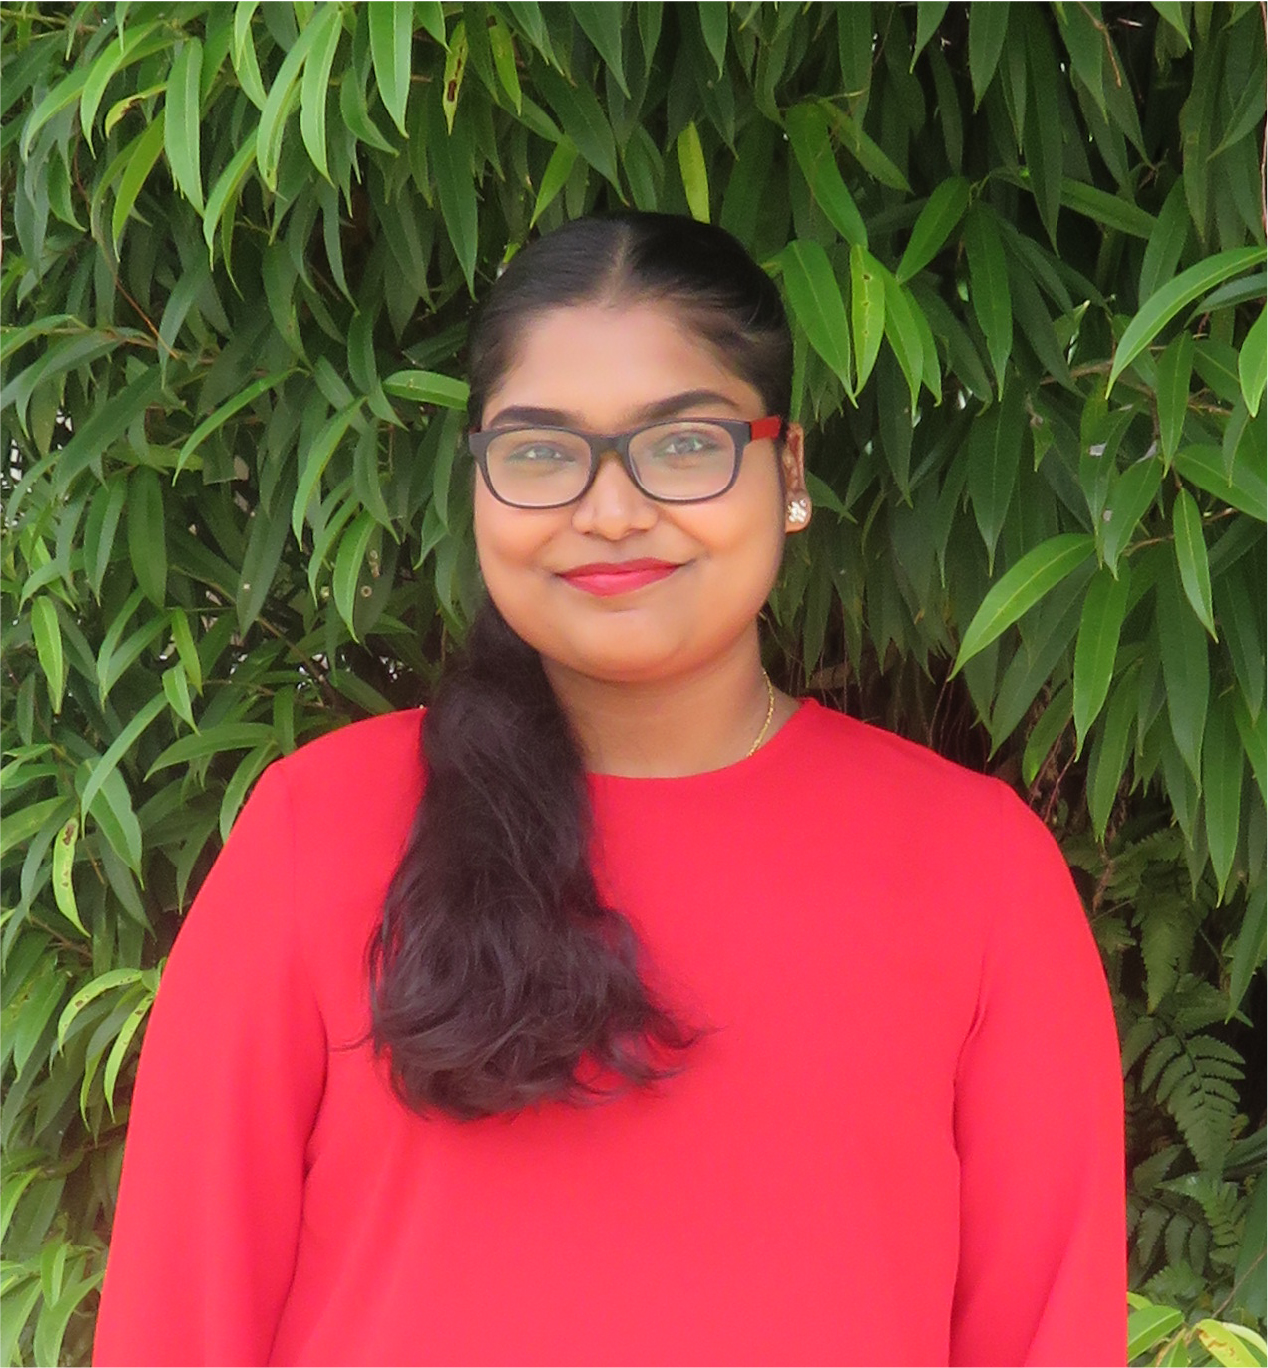 Yasmin Nisha Bte Mohamed Ismail